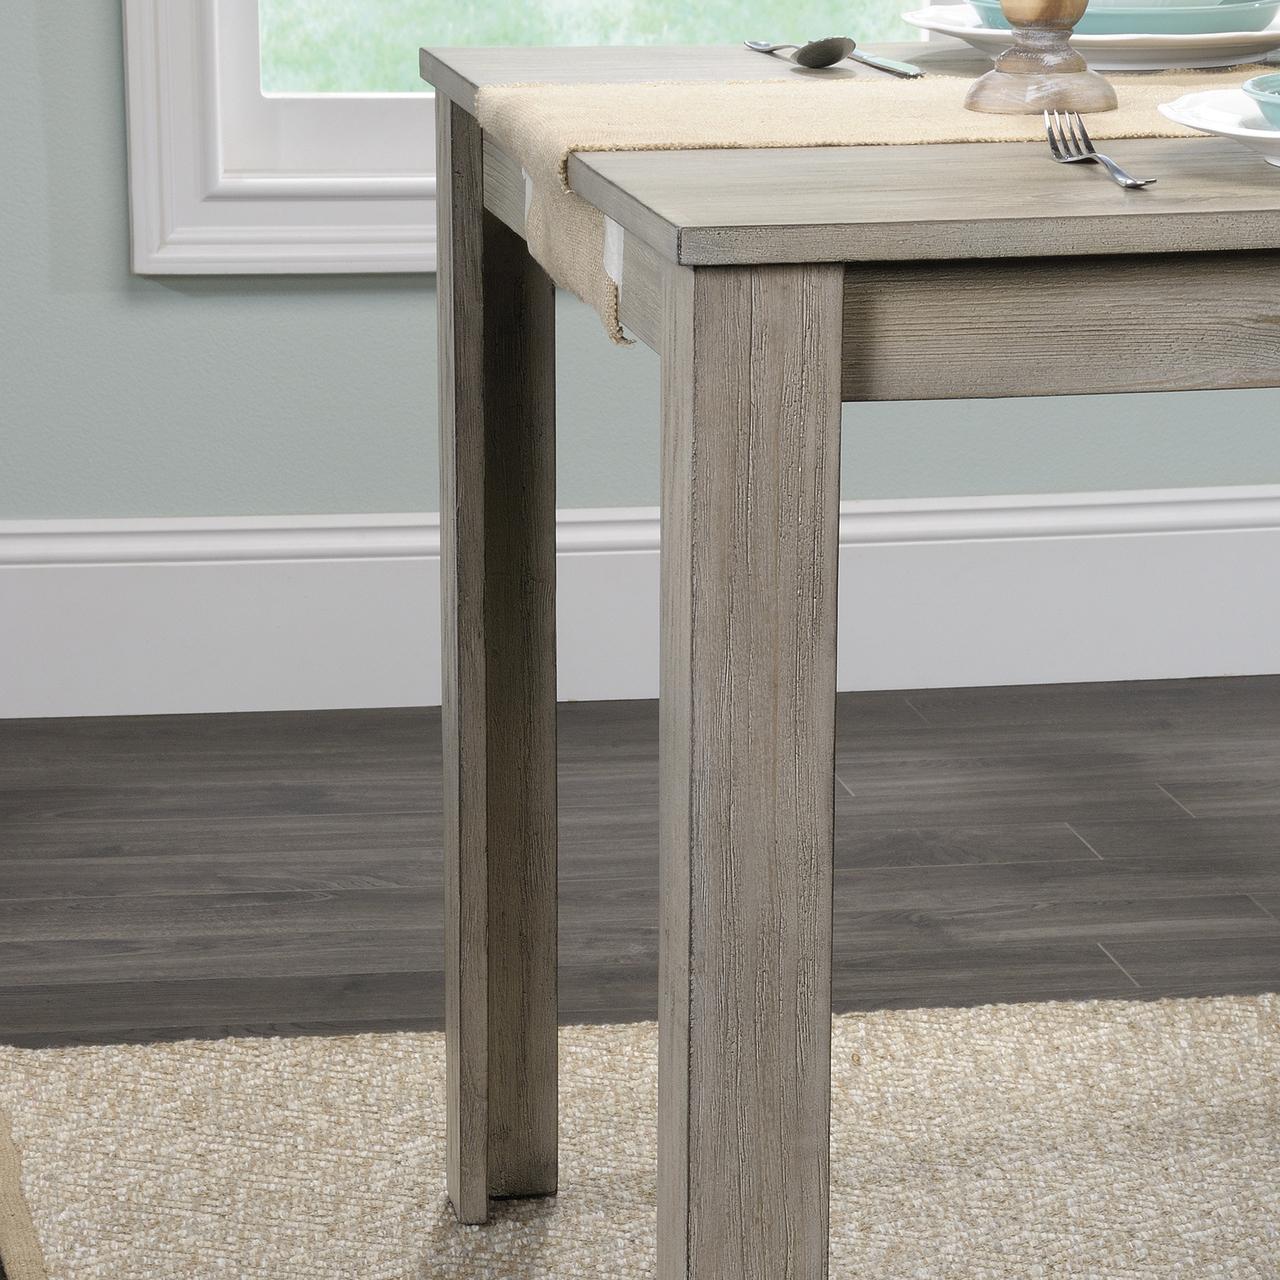 Sauder New Grange Dining Table (418694)